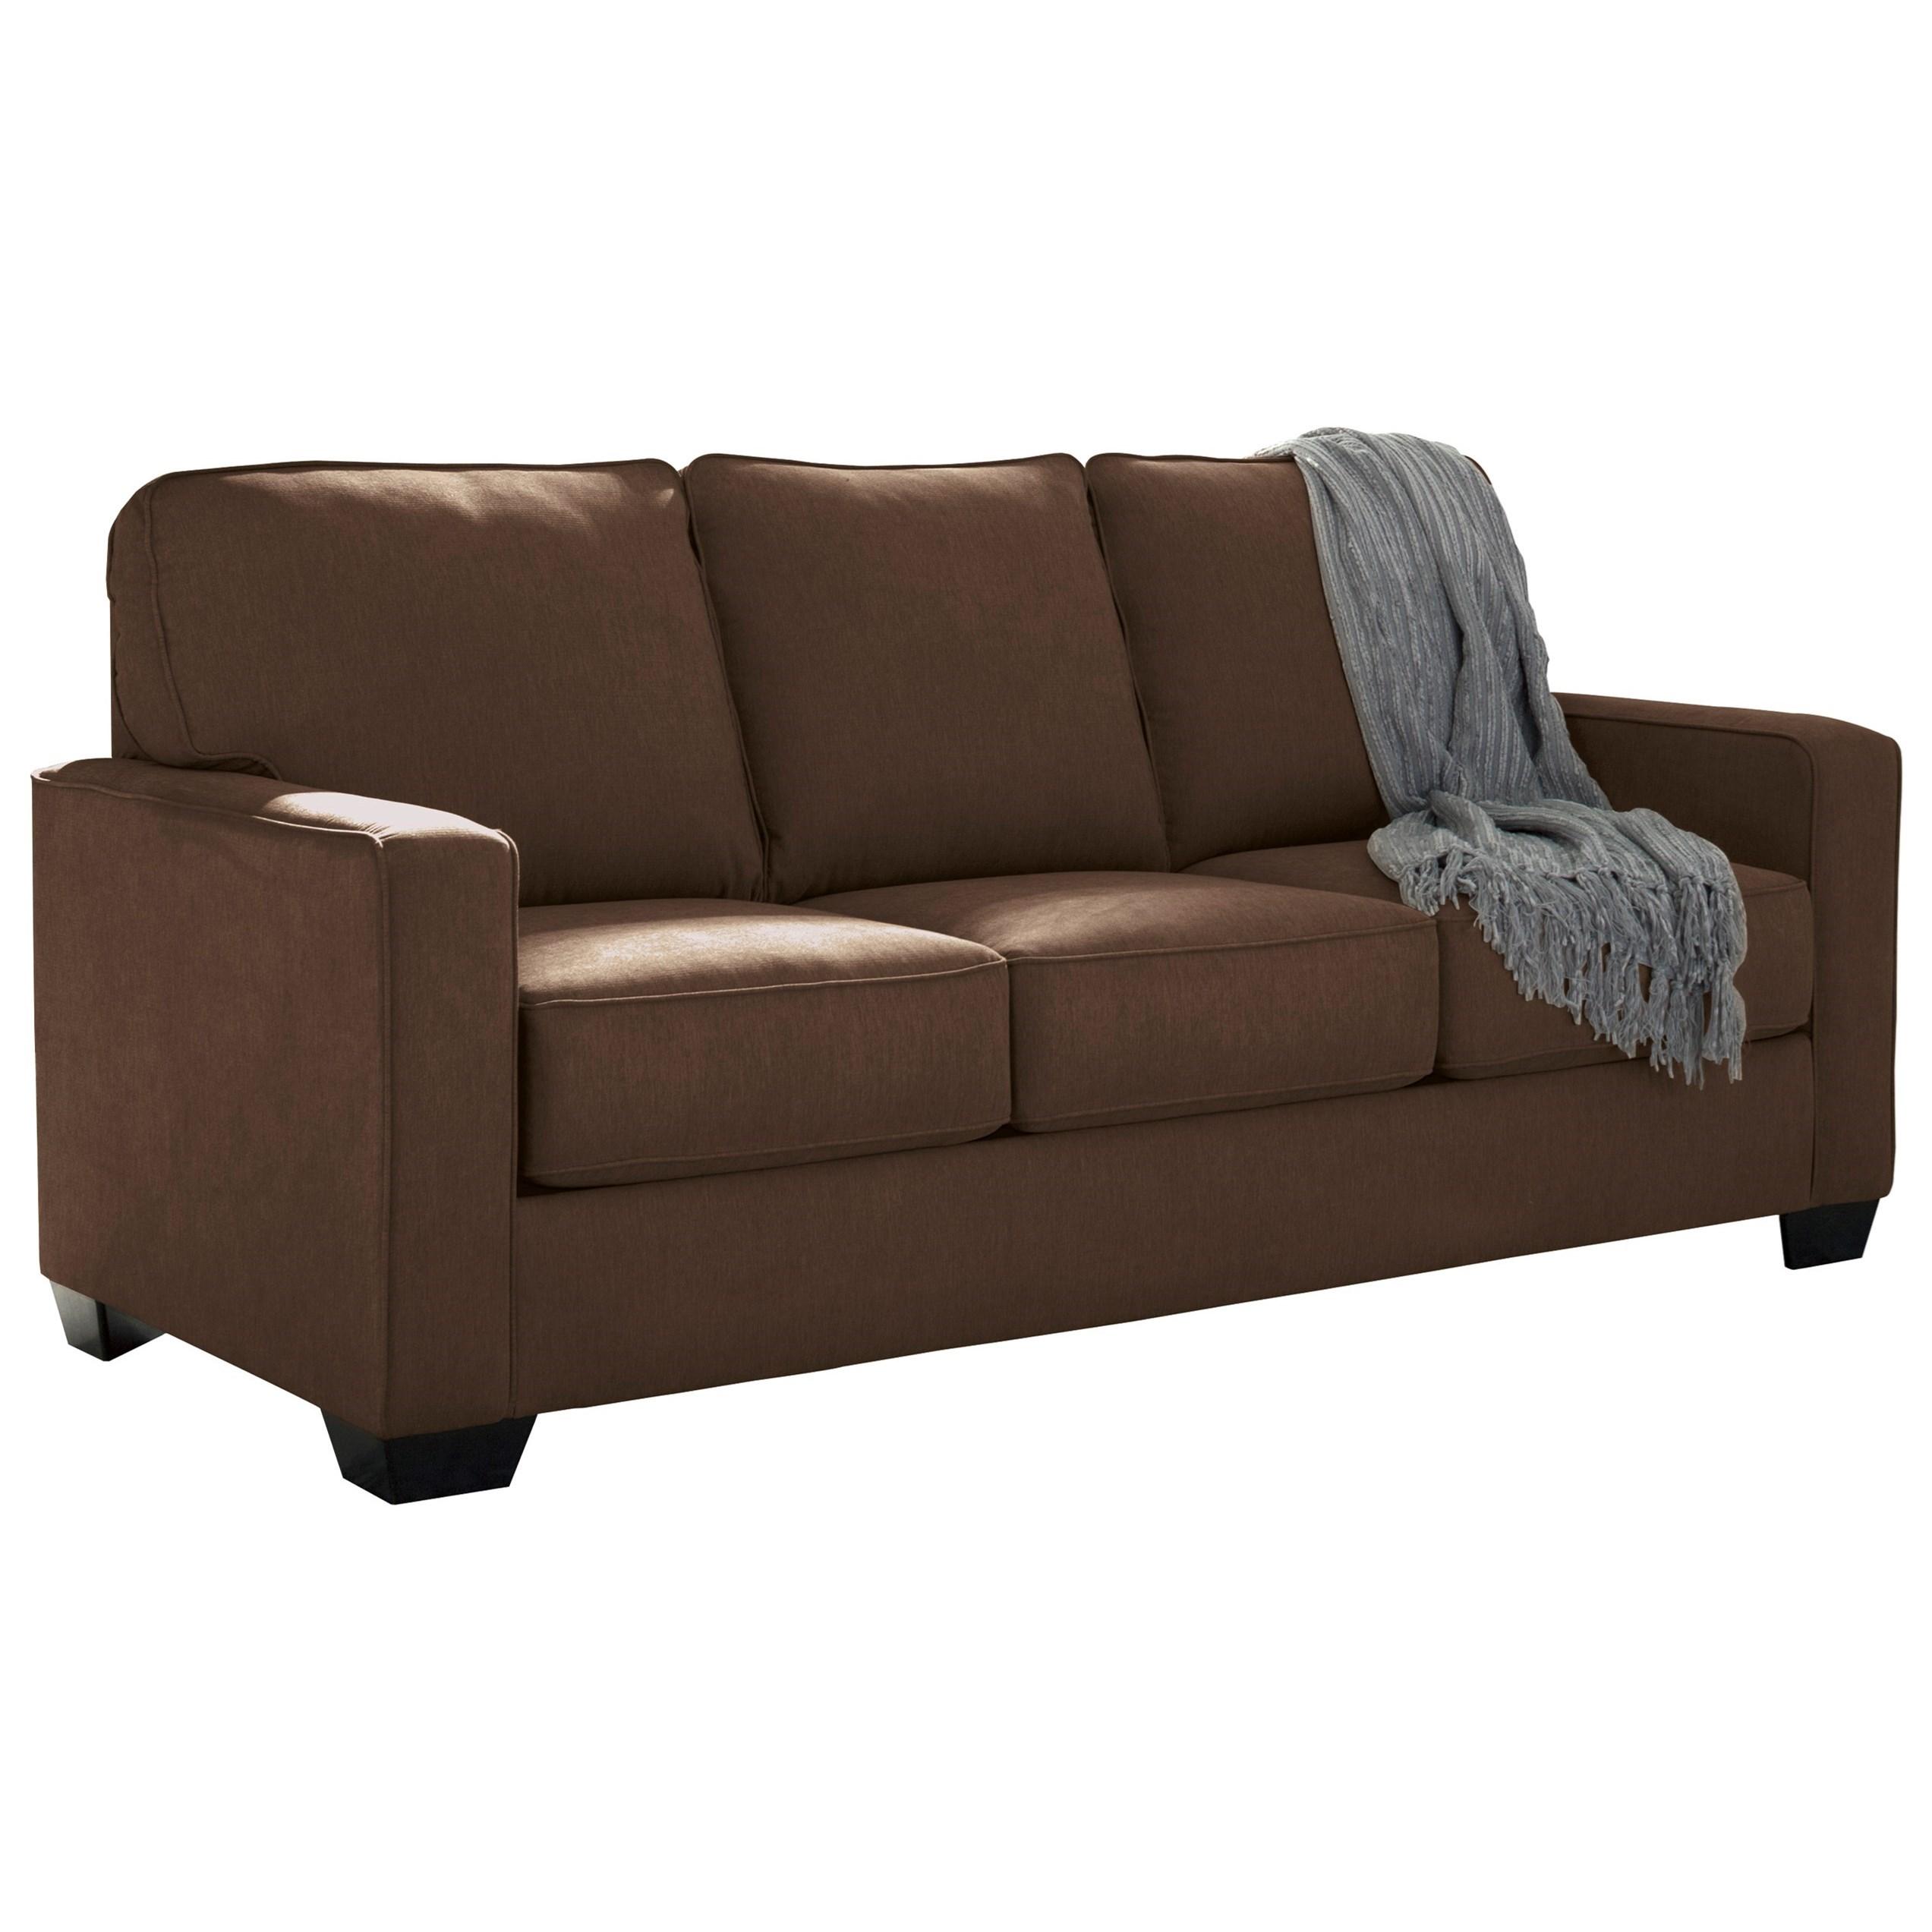 Signature Design by Ashley Zeb 3590336 Full Sofa Sleeper  Northeast Factory Direct  Sofa